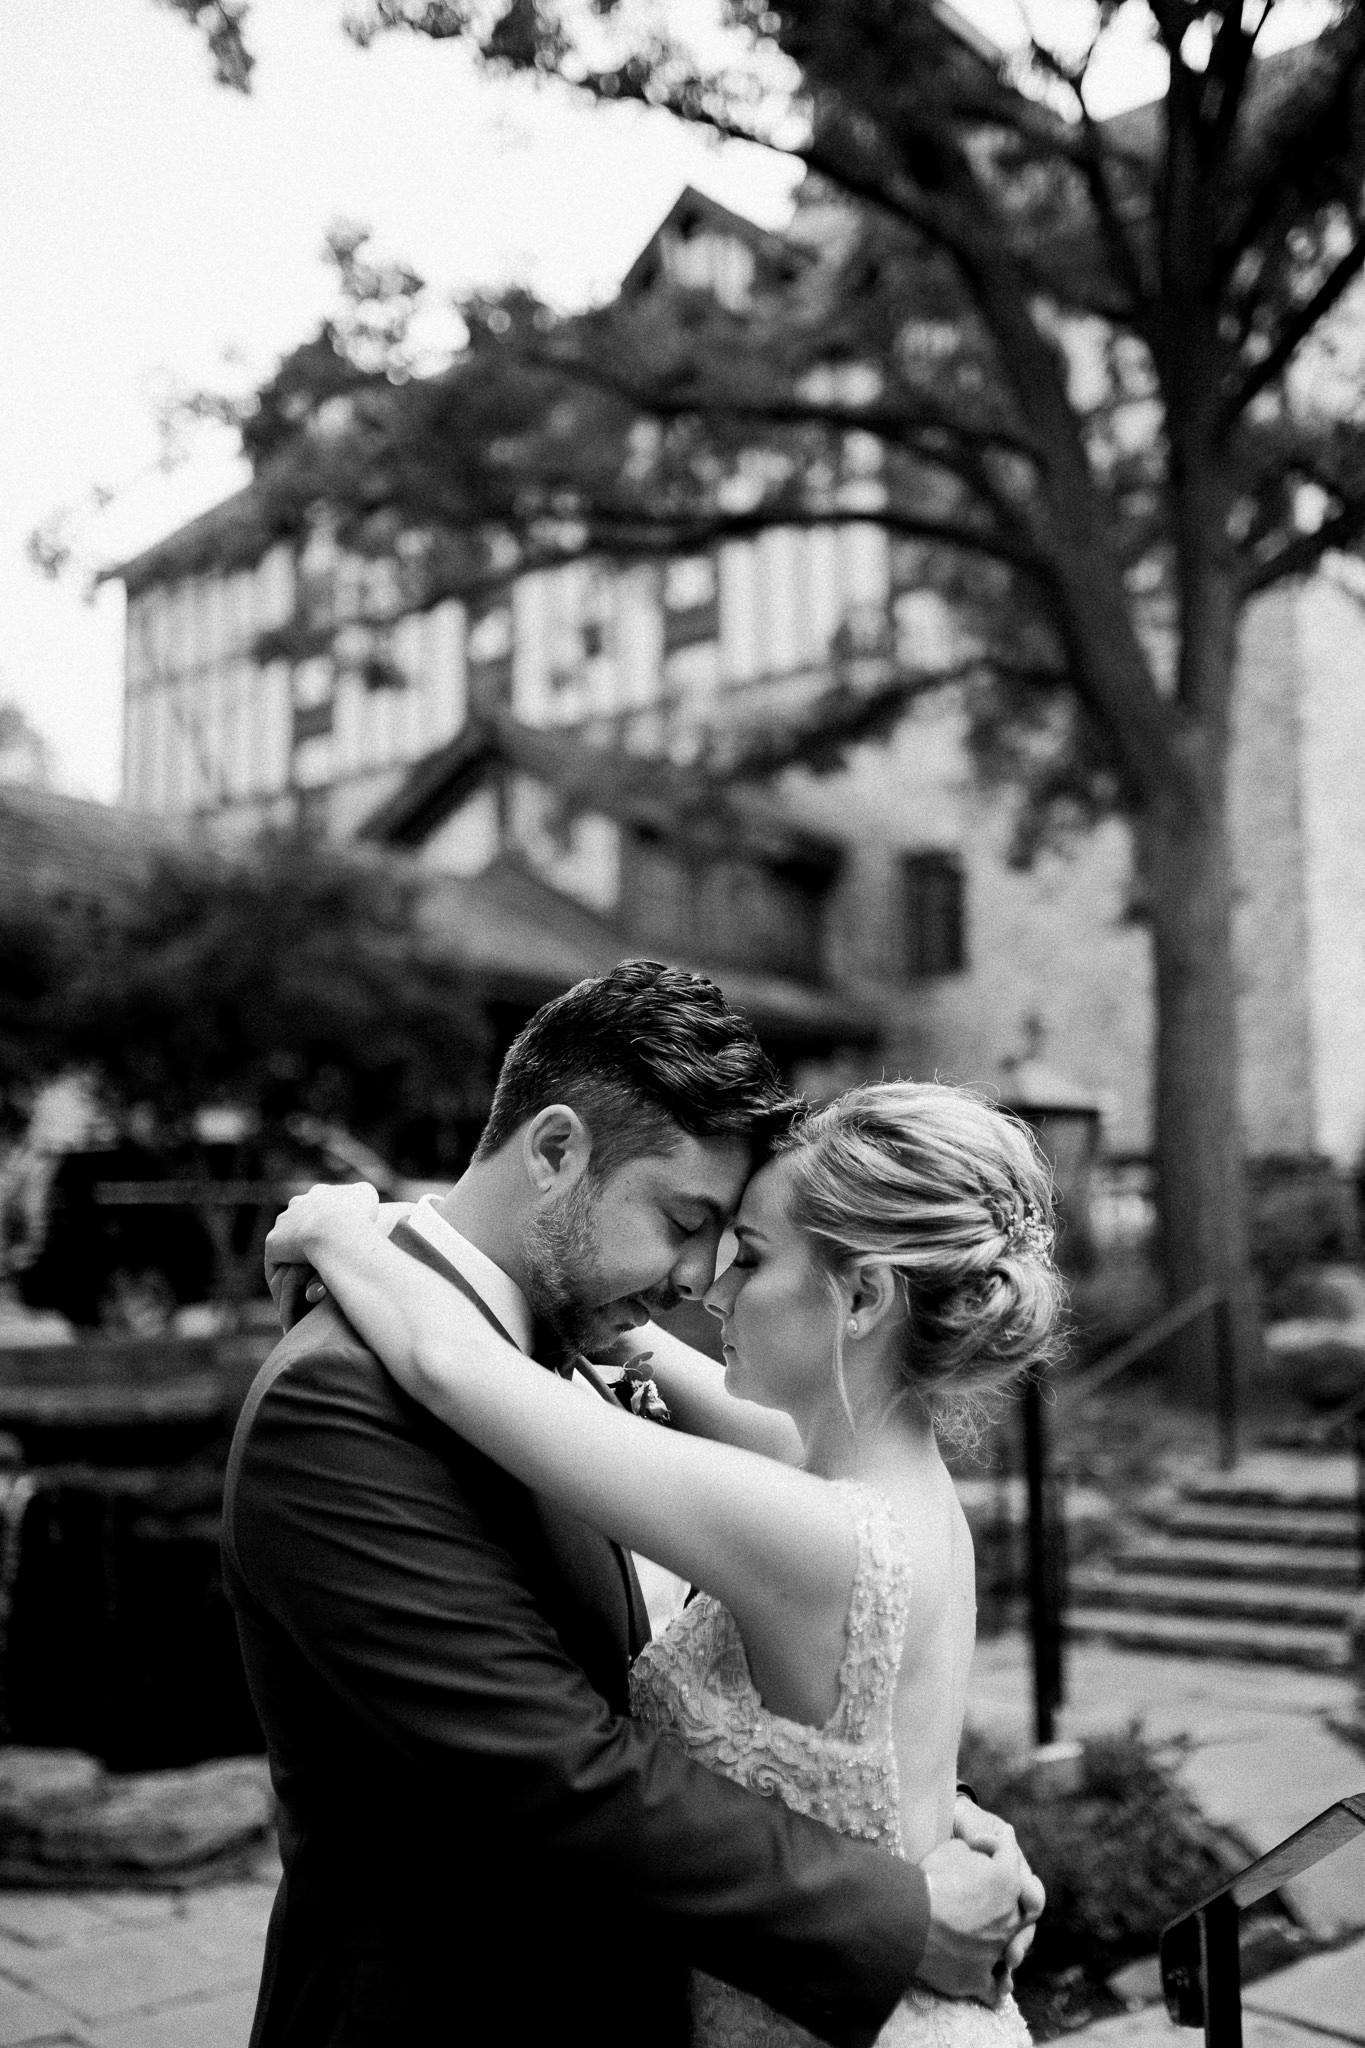 Toronto summer wedding at Old Mill Inn by Max Wong Photo (37)